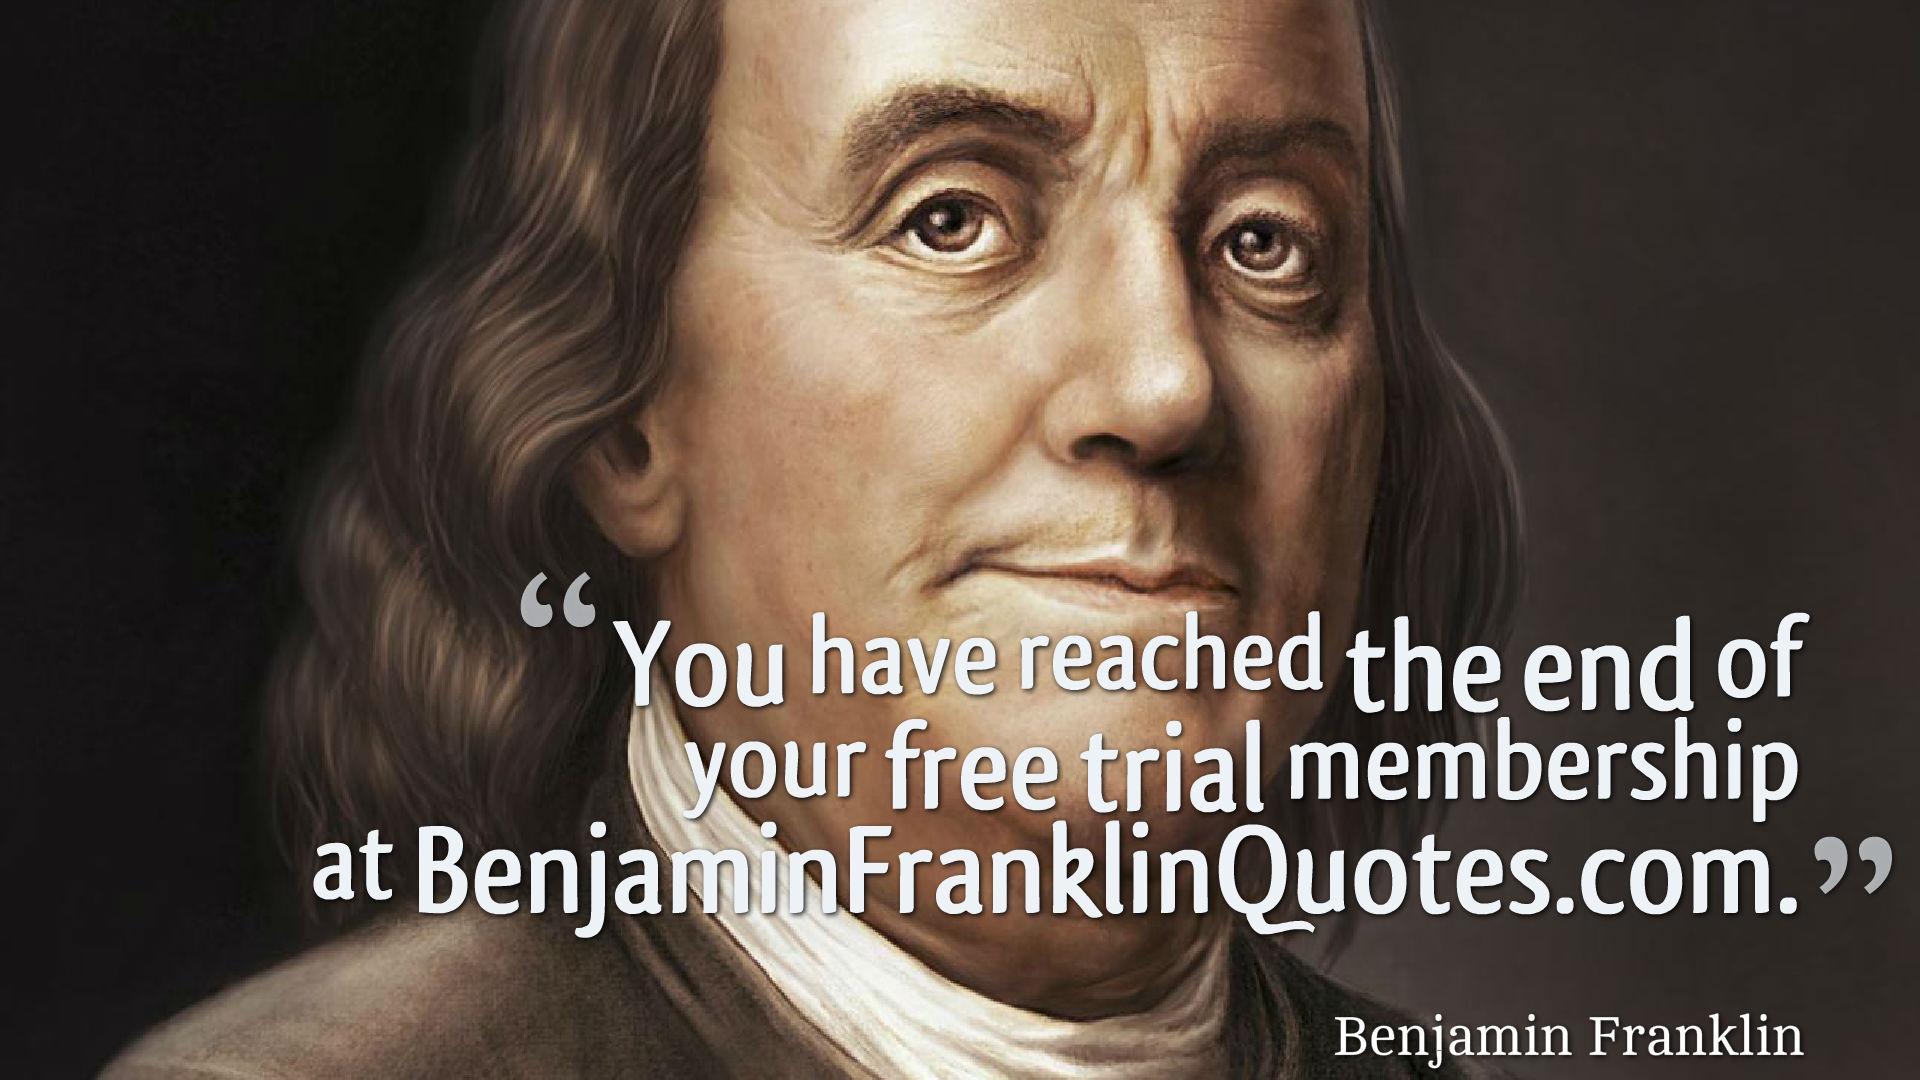 [image] Benjamin Franklin said it best